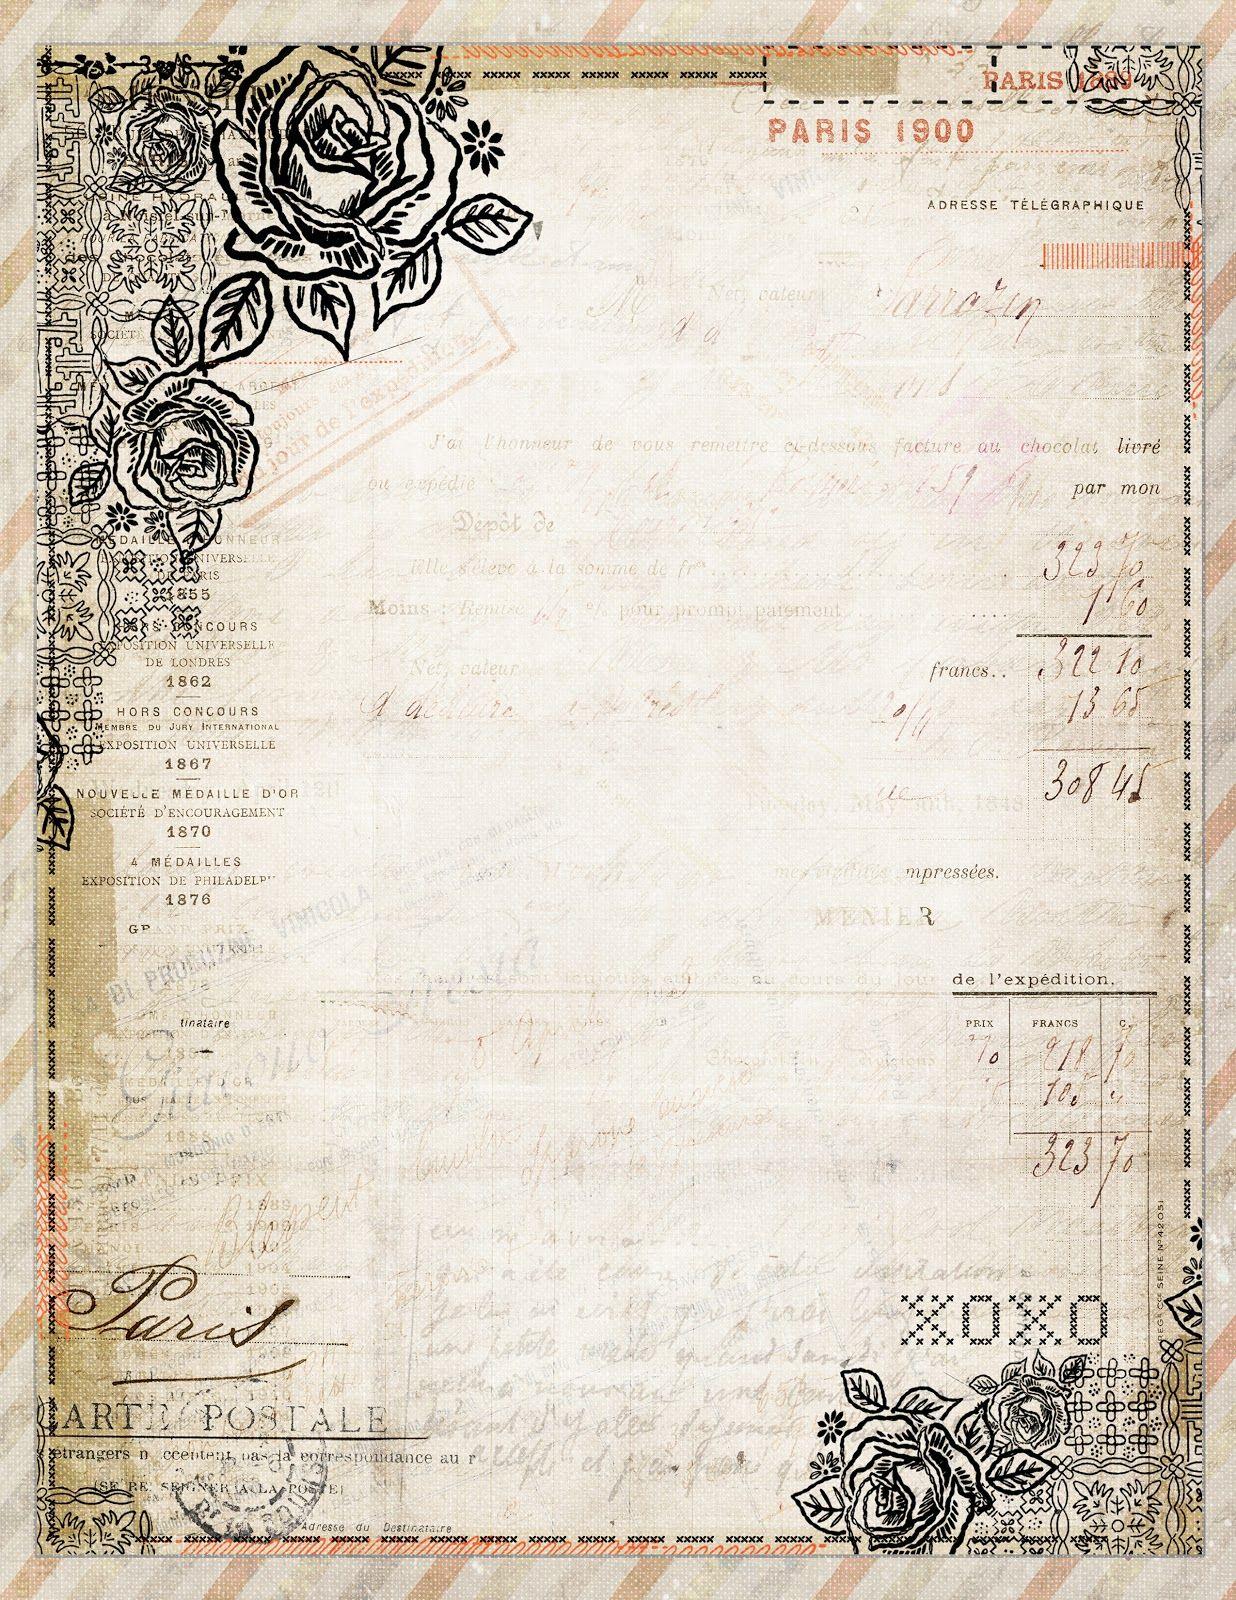 Free Printable Stationery Vintage Backgrounds - 2.12.kaartenstemp.nl • - Free Printable Stationery